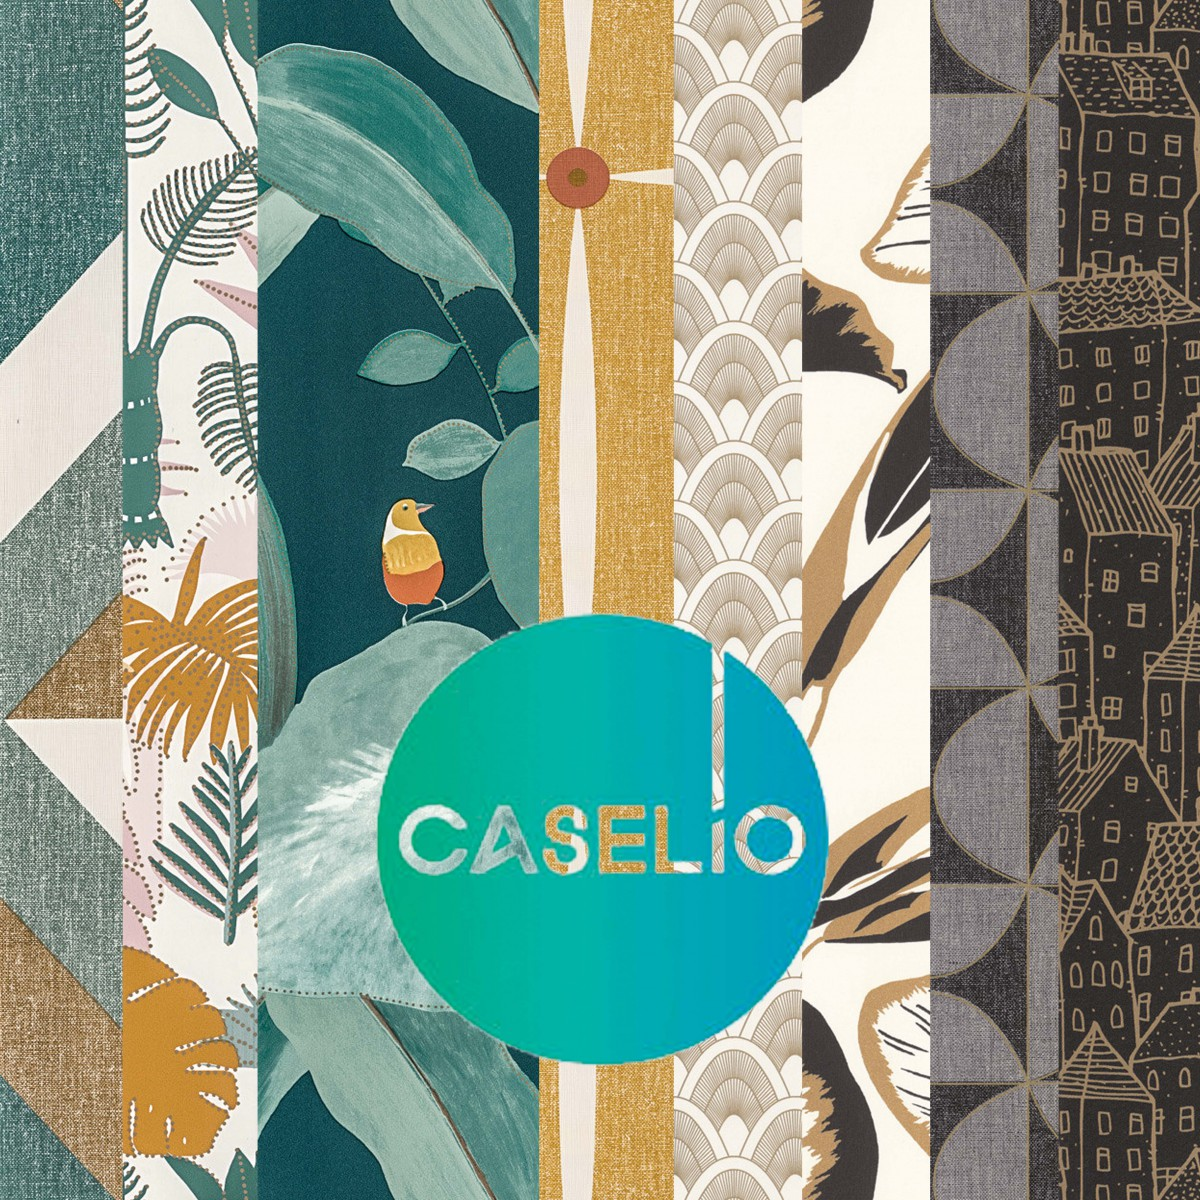 caselio-couverture-1